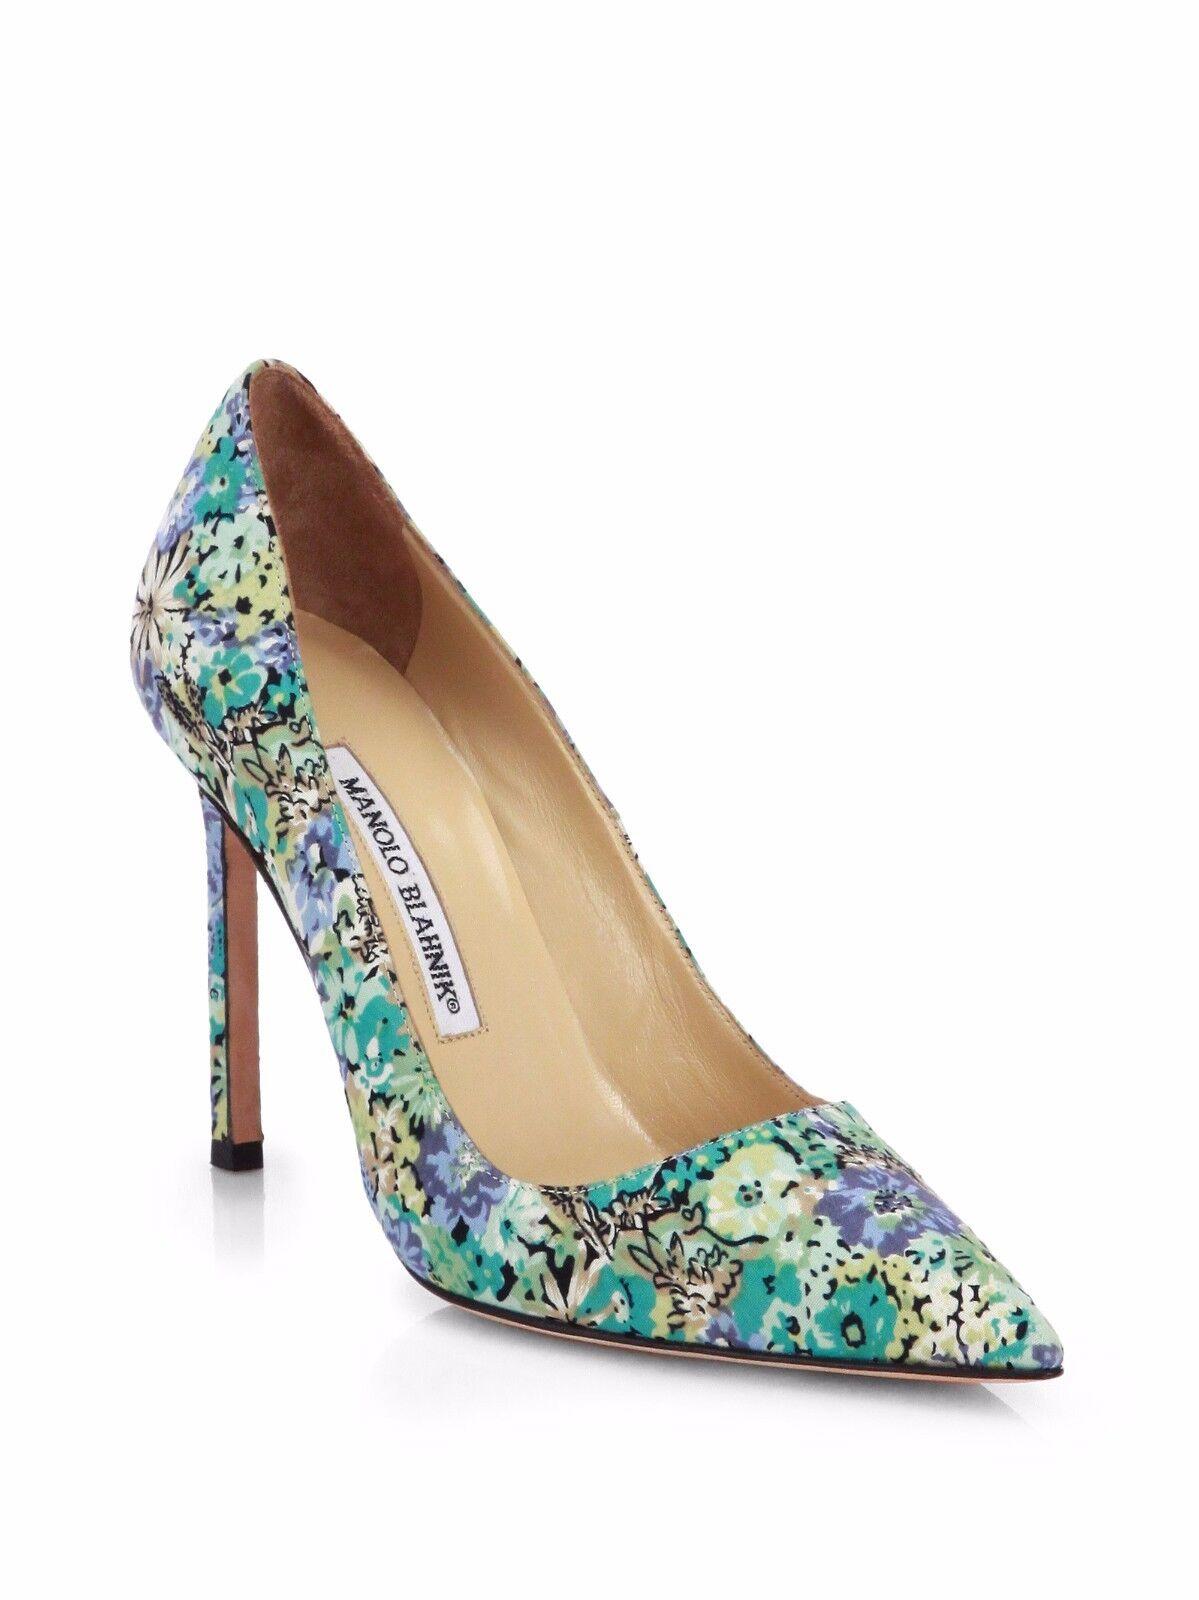 NIB   665 MANOLO BLAINIK BB Floral -Print 105 POINTED TOE PUMP scarpe 36   6  sconto